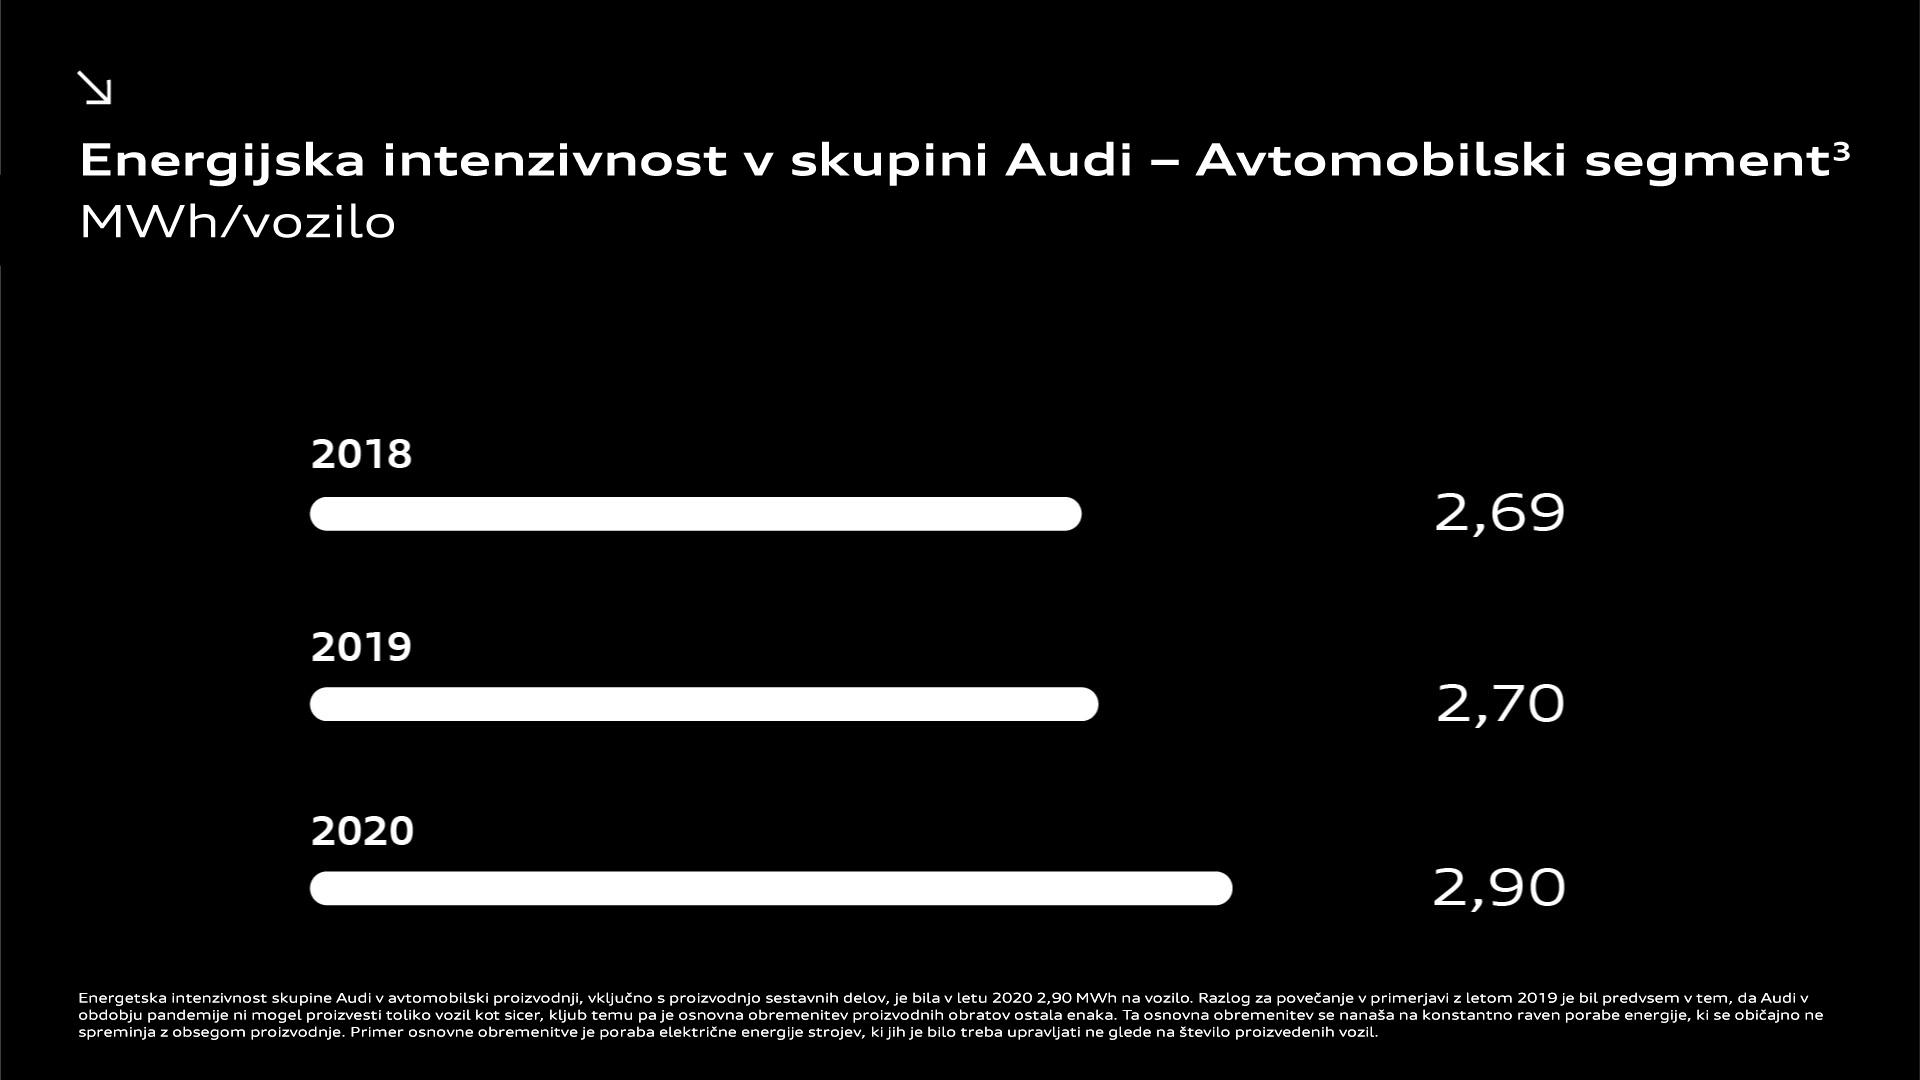 Energijska intenzivnost v skupini Audi - Avtomobilski segment